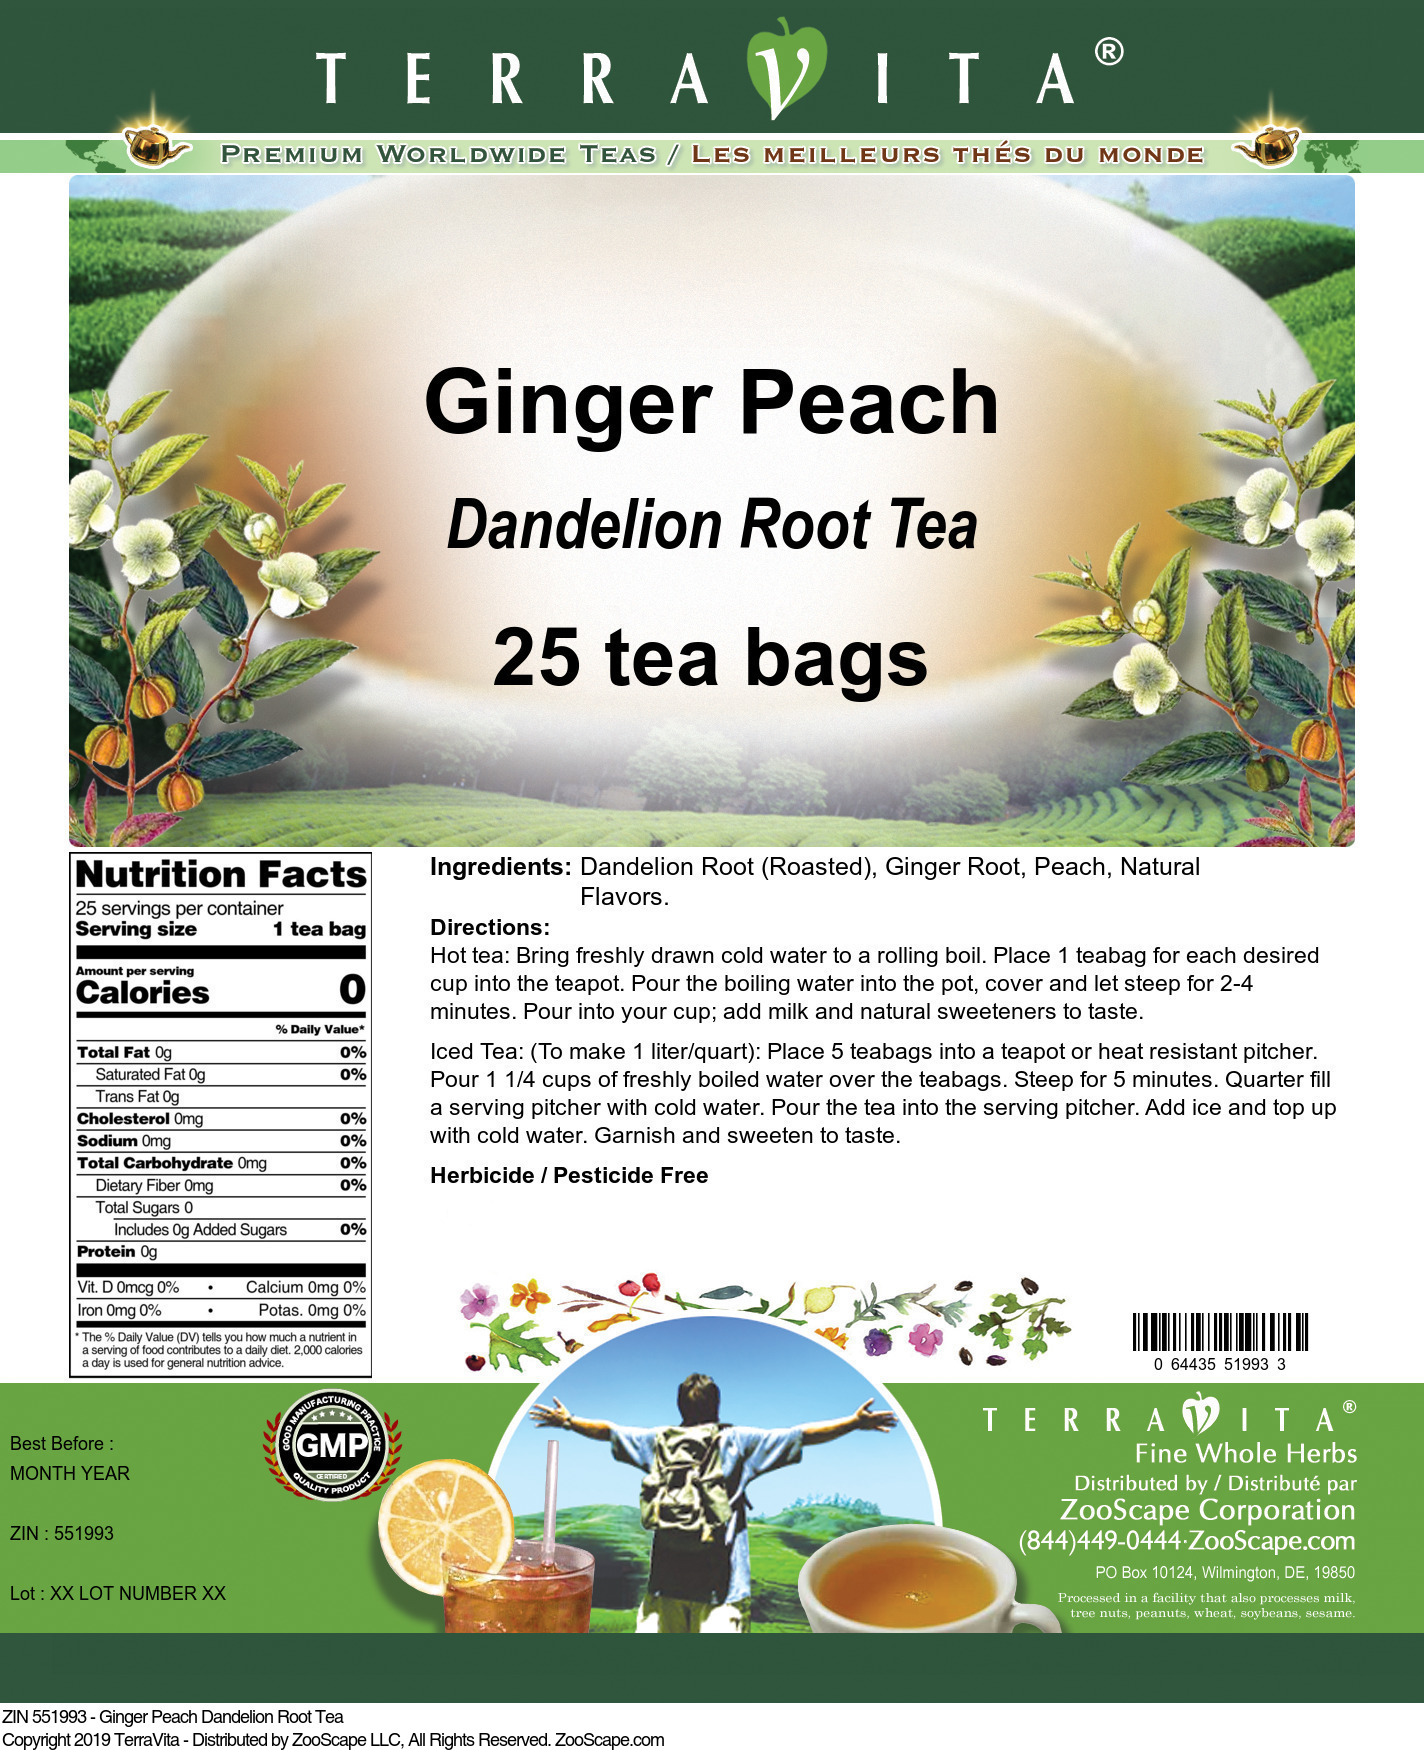 Ginger Peach Dandelion Root